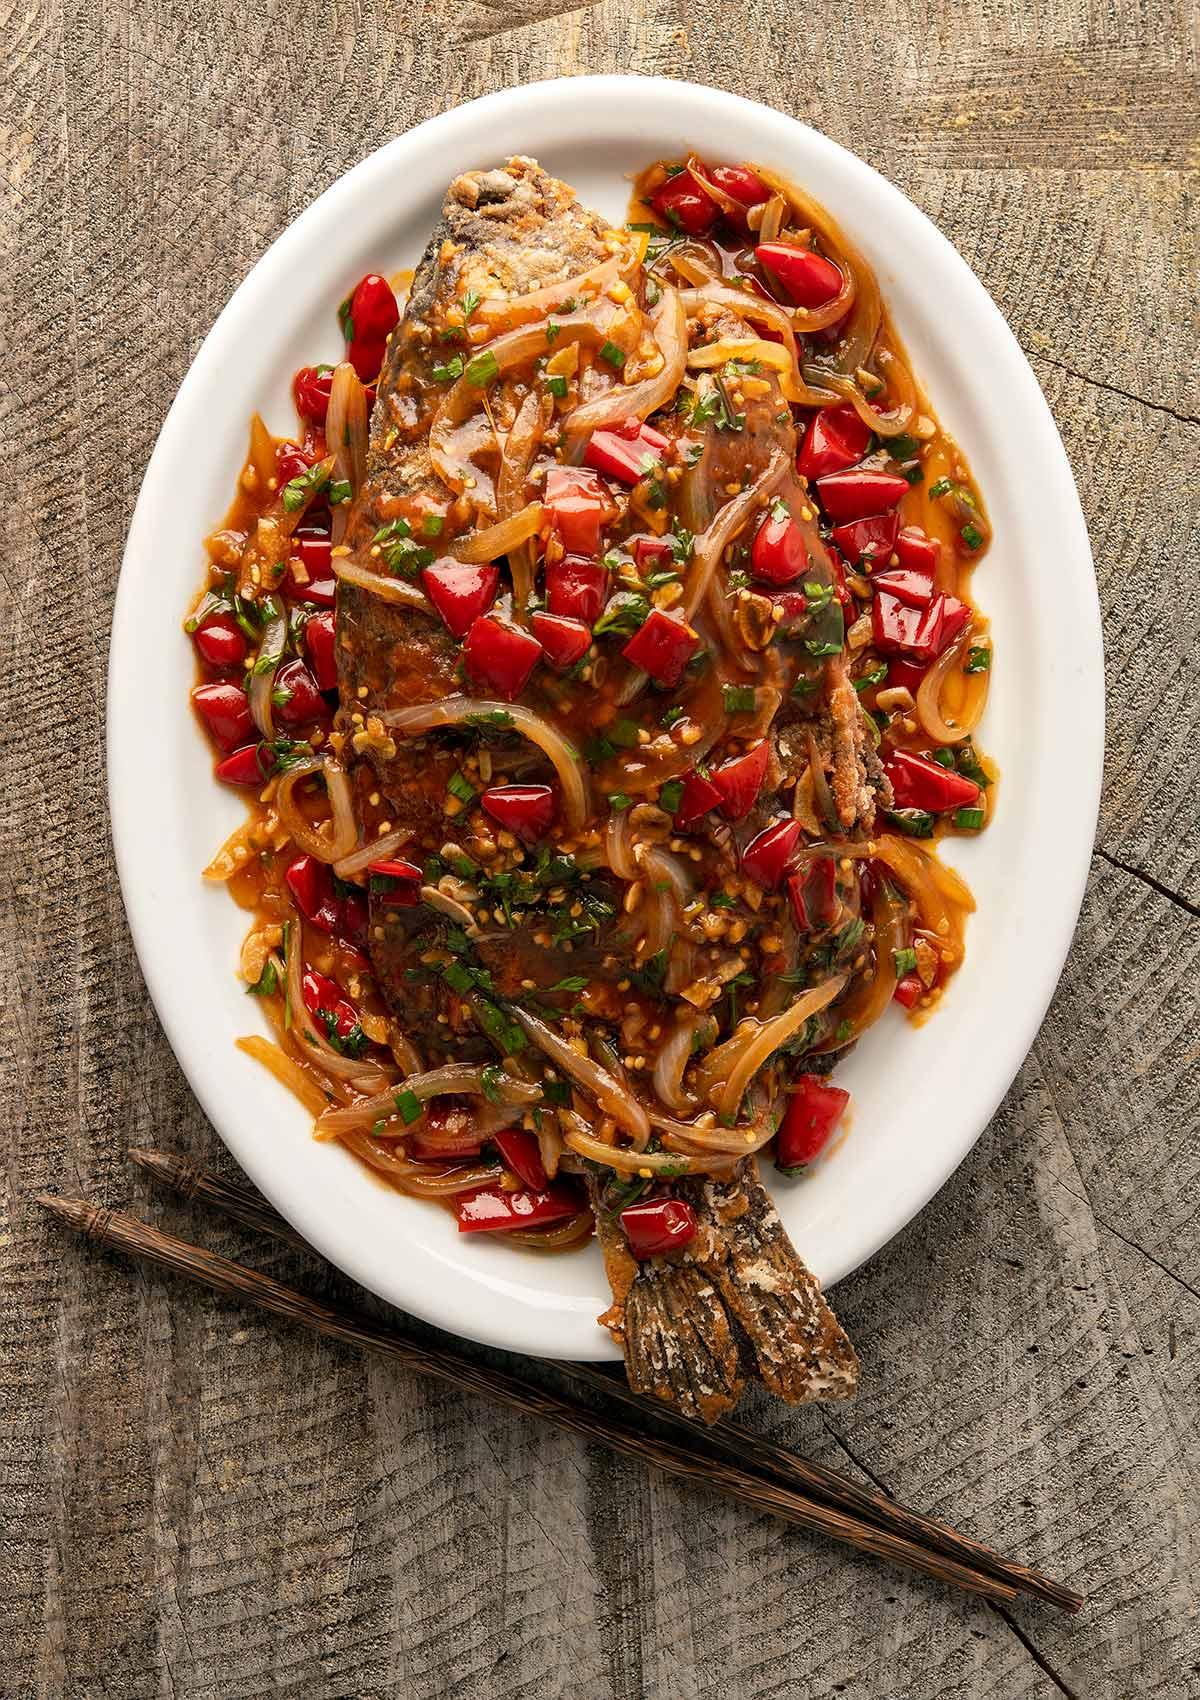 Overhead view of Chinese crispy fried carp recipe